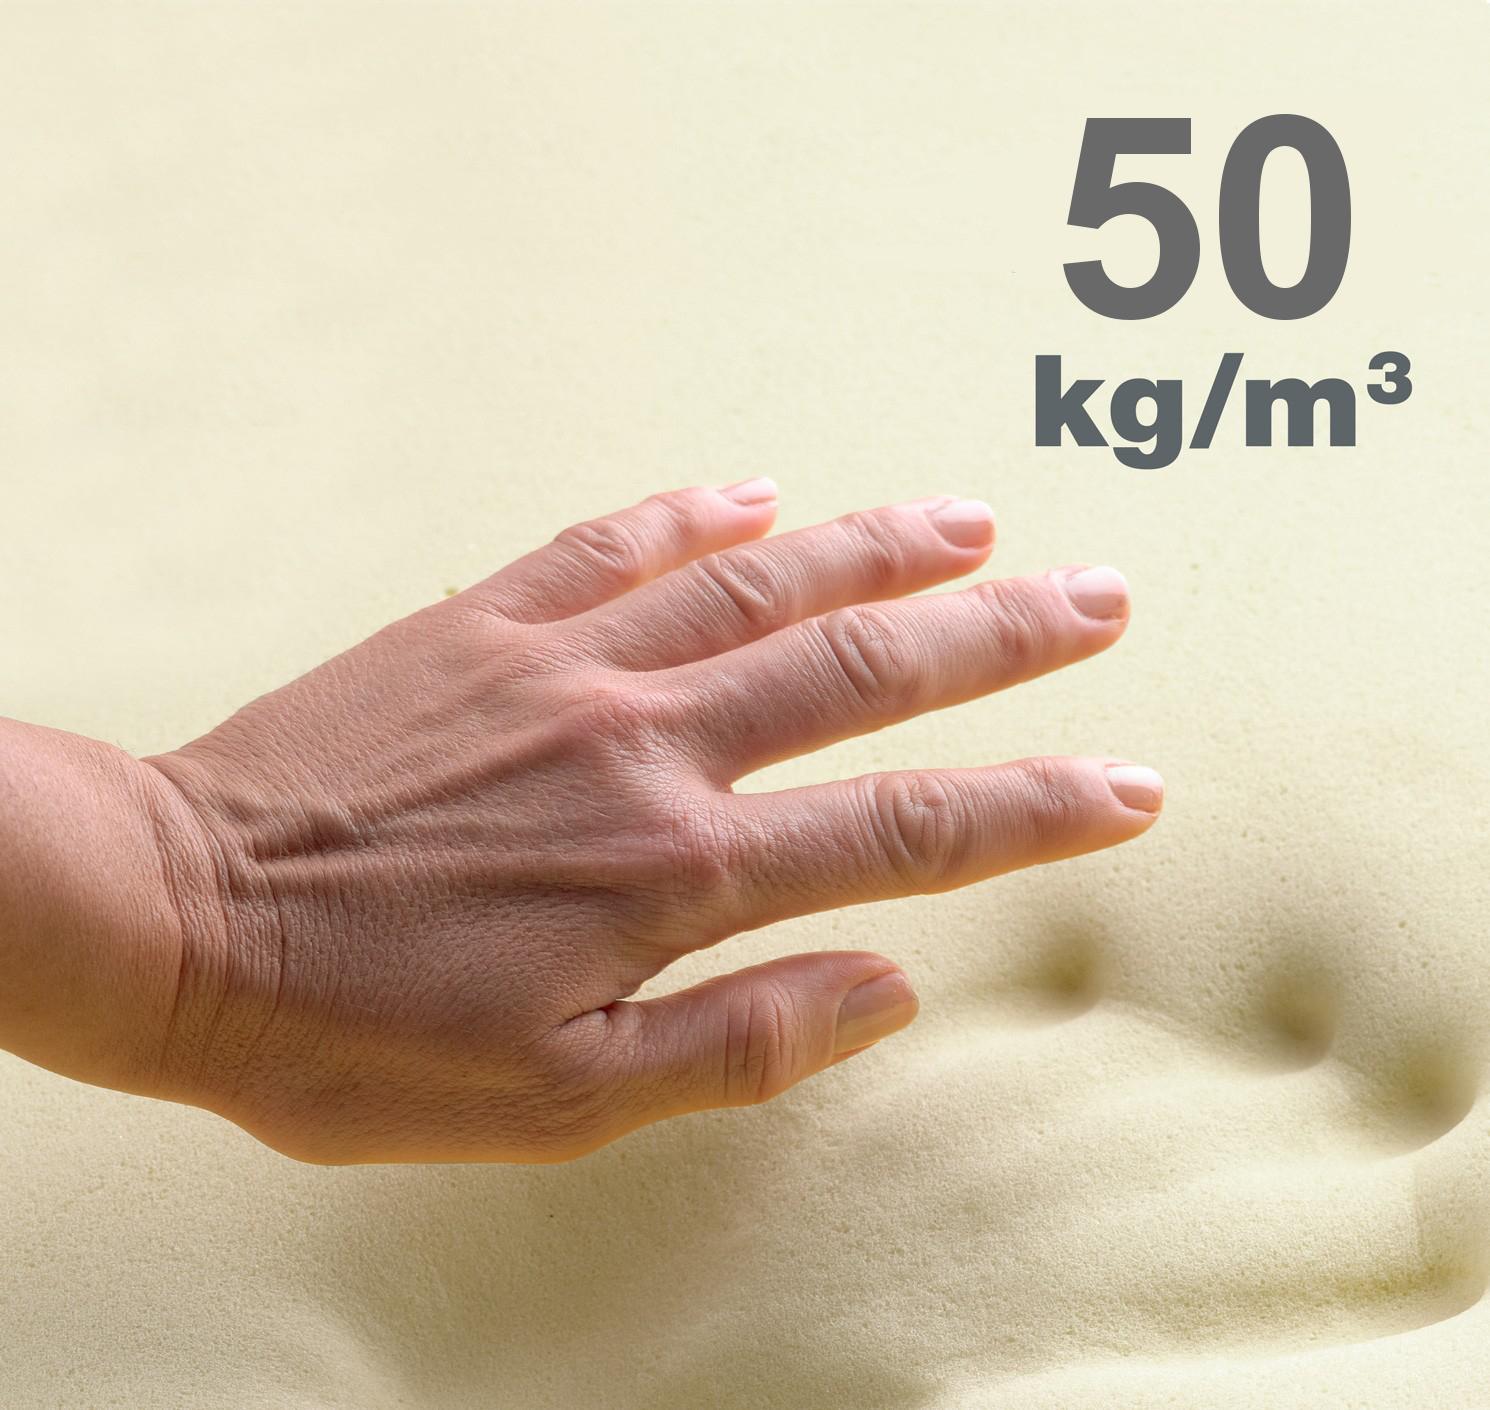 memory-foam-density-45kg_7_8